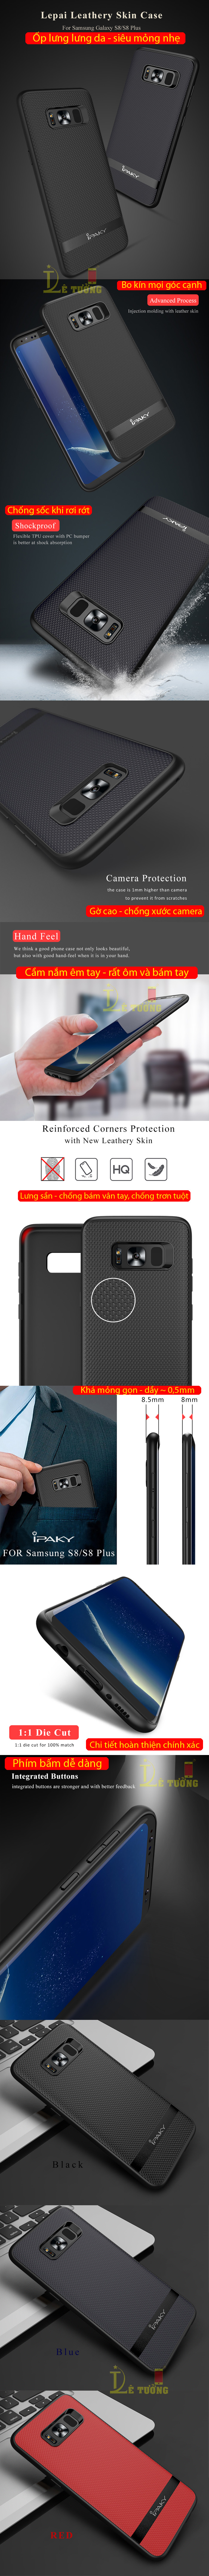 Ốp lưng Galaxy S8 Plus Ipaky Leather Skin Case chống vân tay 4